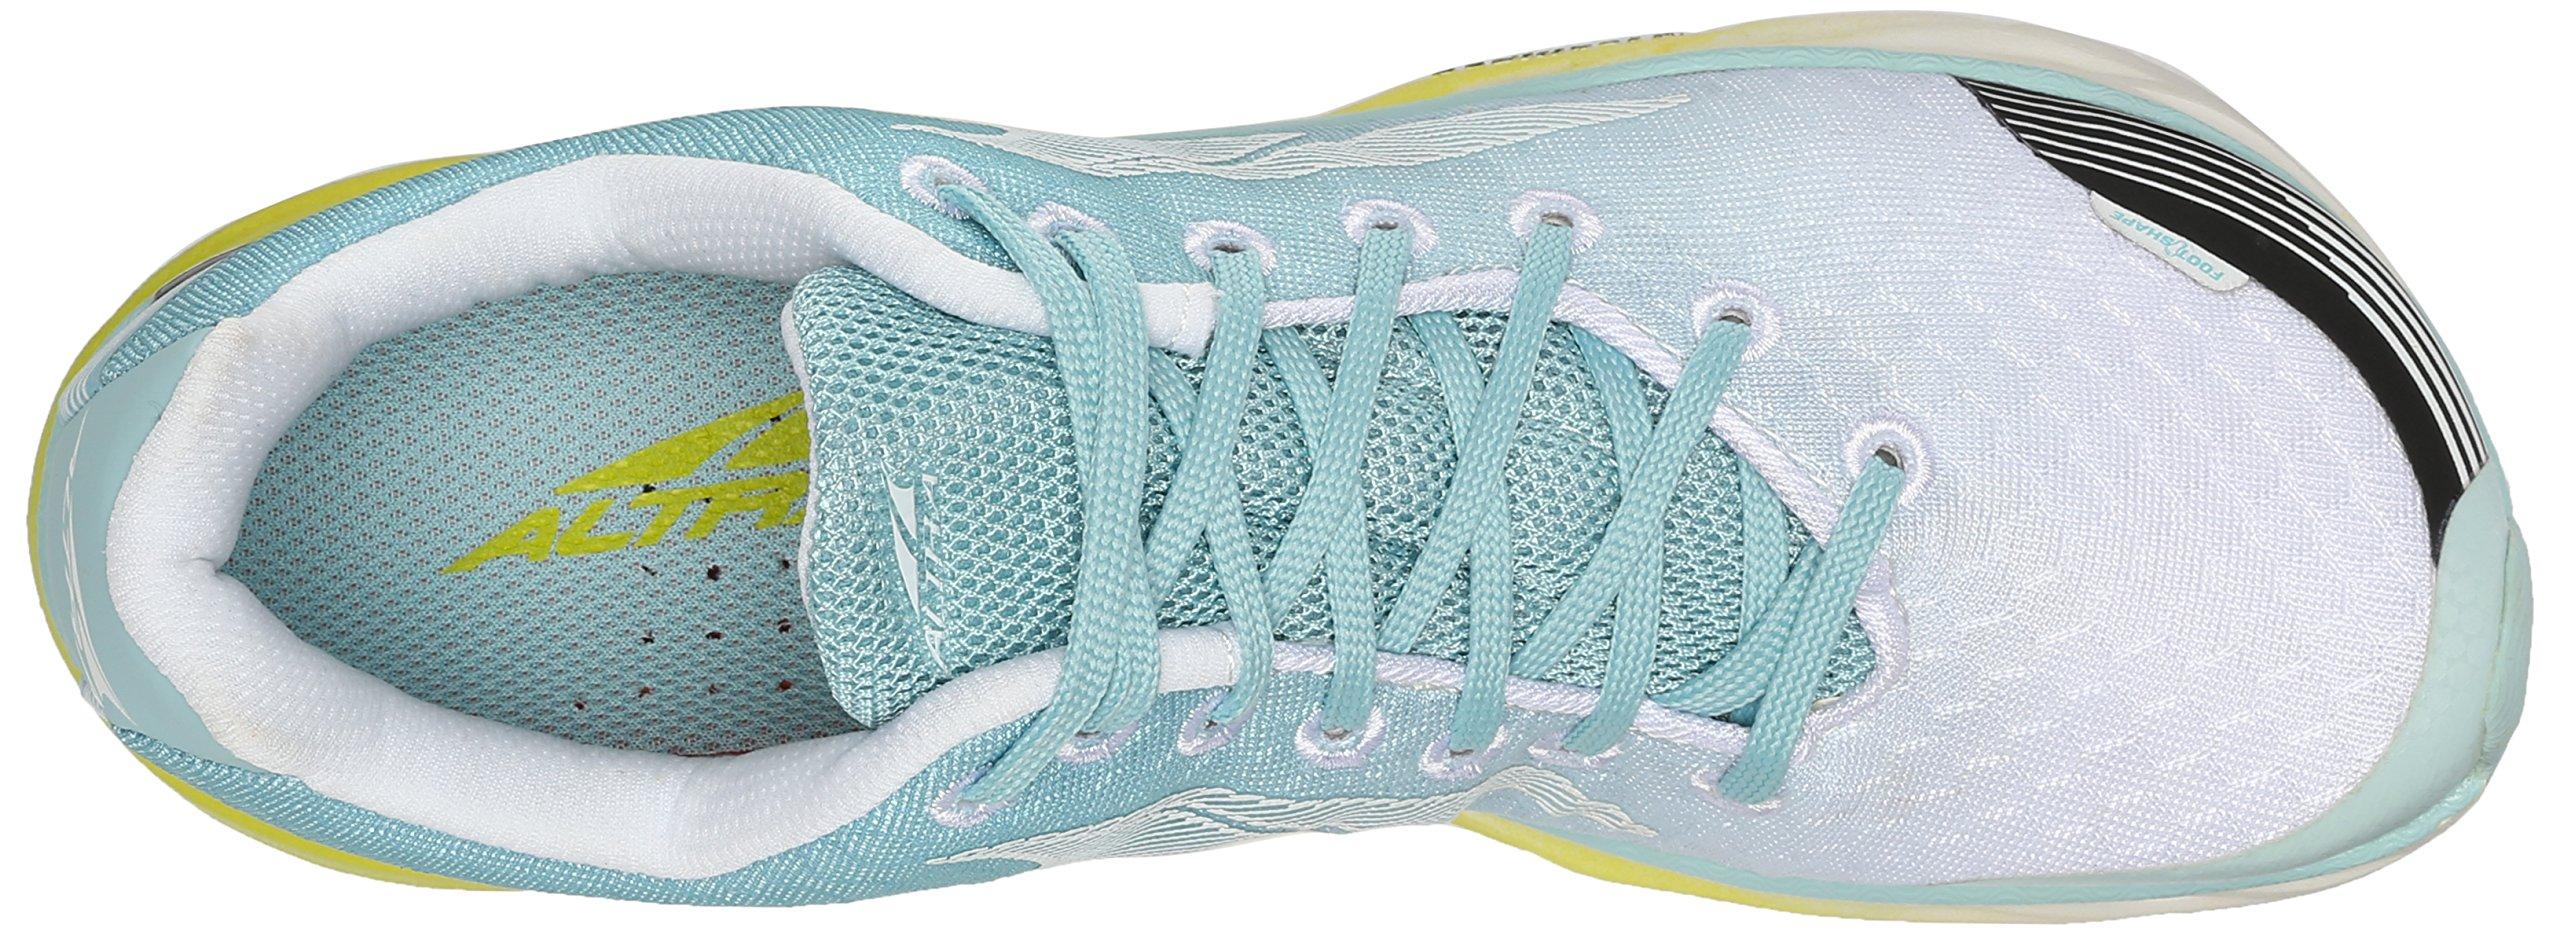 91YO XVnMIL - Altra Women's Impulse Running Shoe